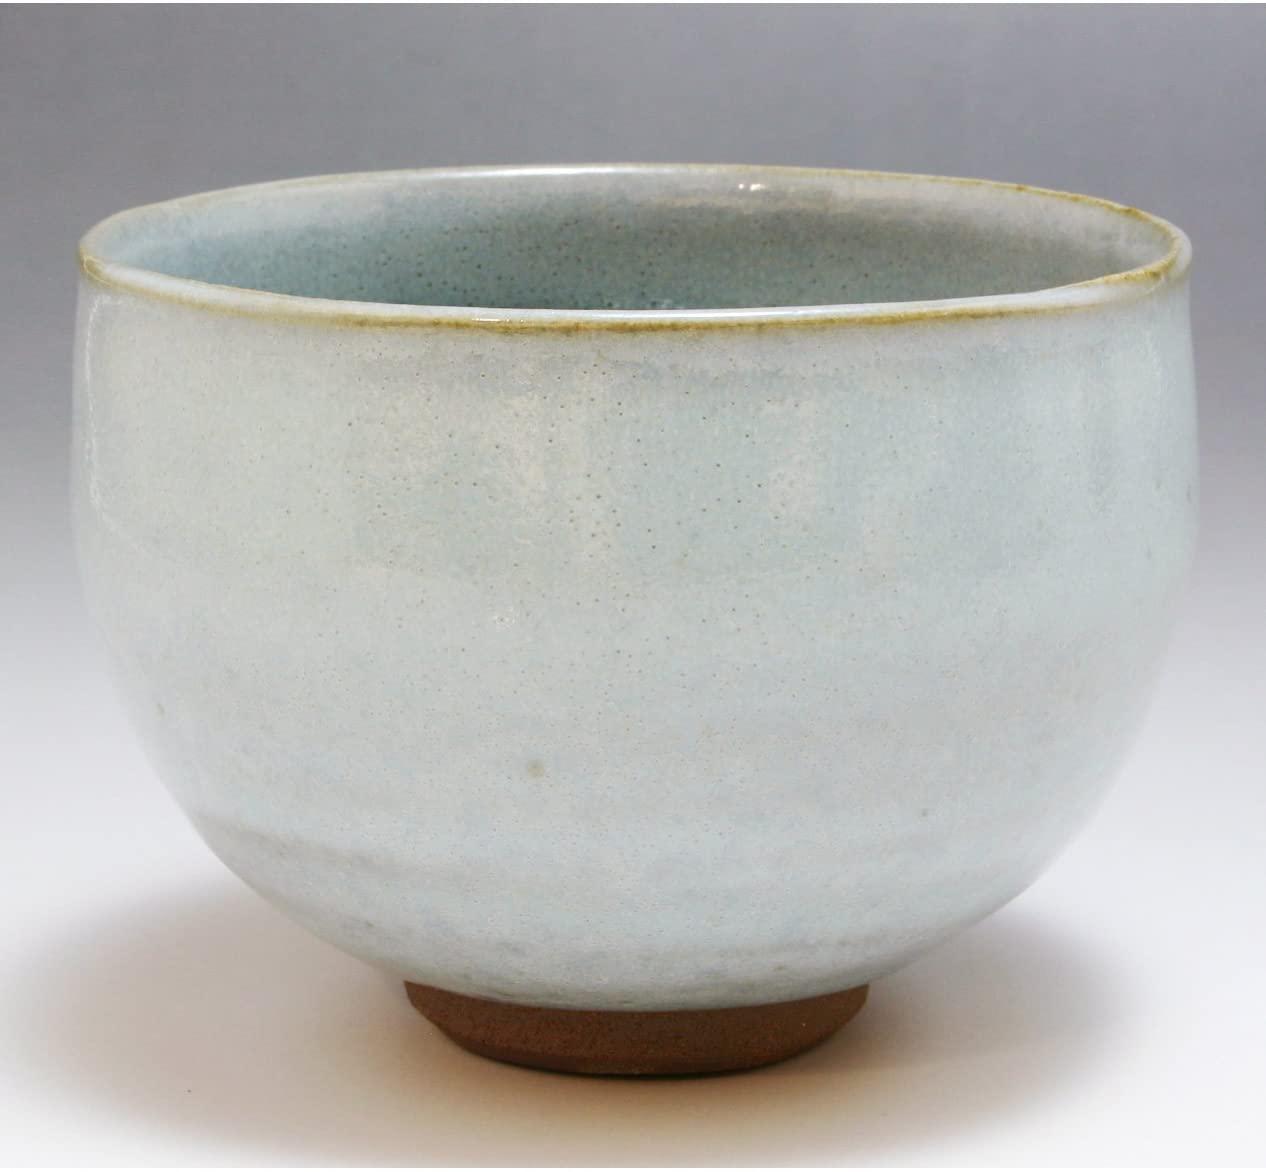 Kiyomizu-kyo yaki ware. Japanese Matcha chawan teabowl Geppaku glaze with paper box. Ceramic. kymz-TDG398